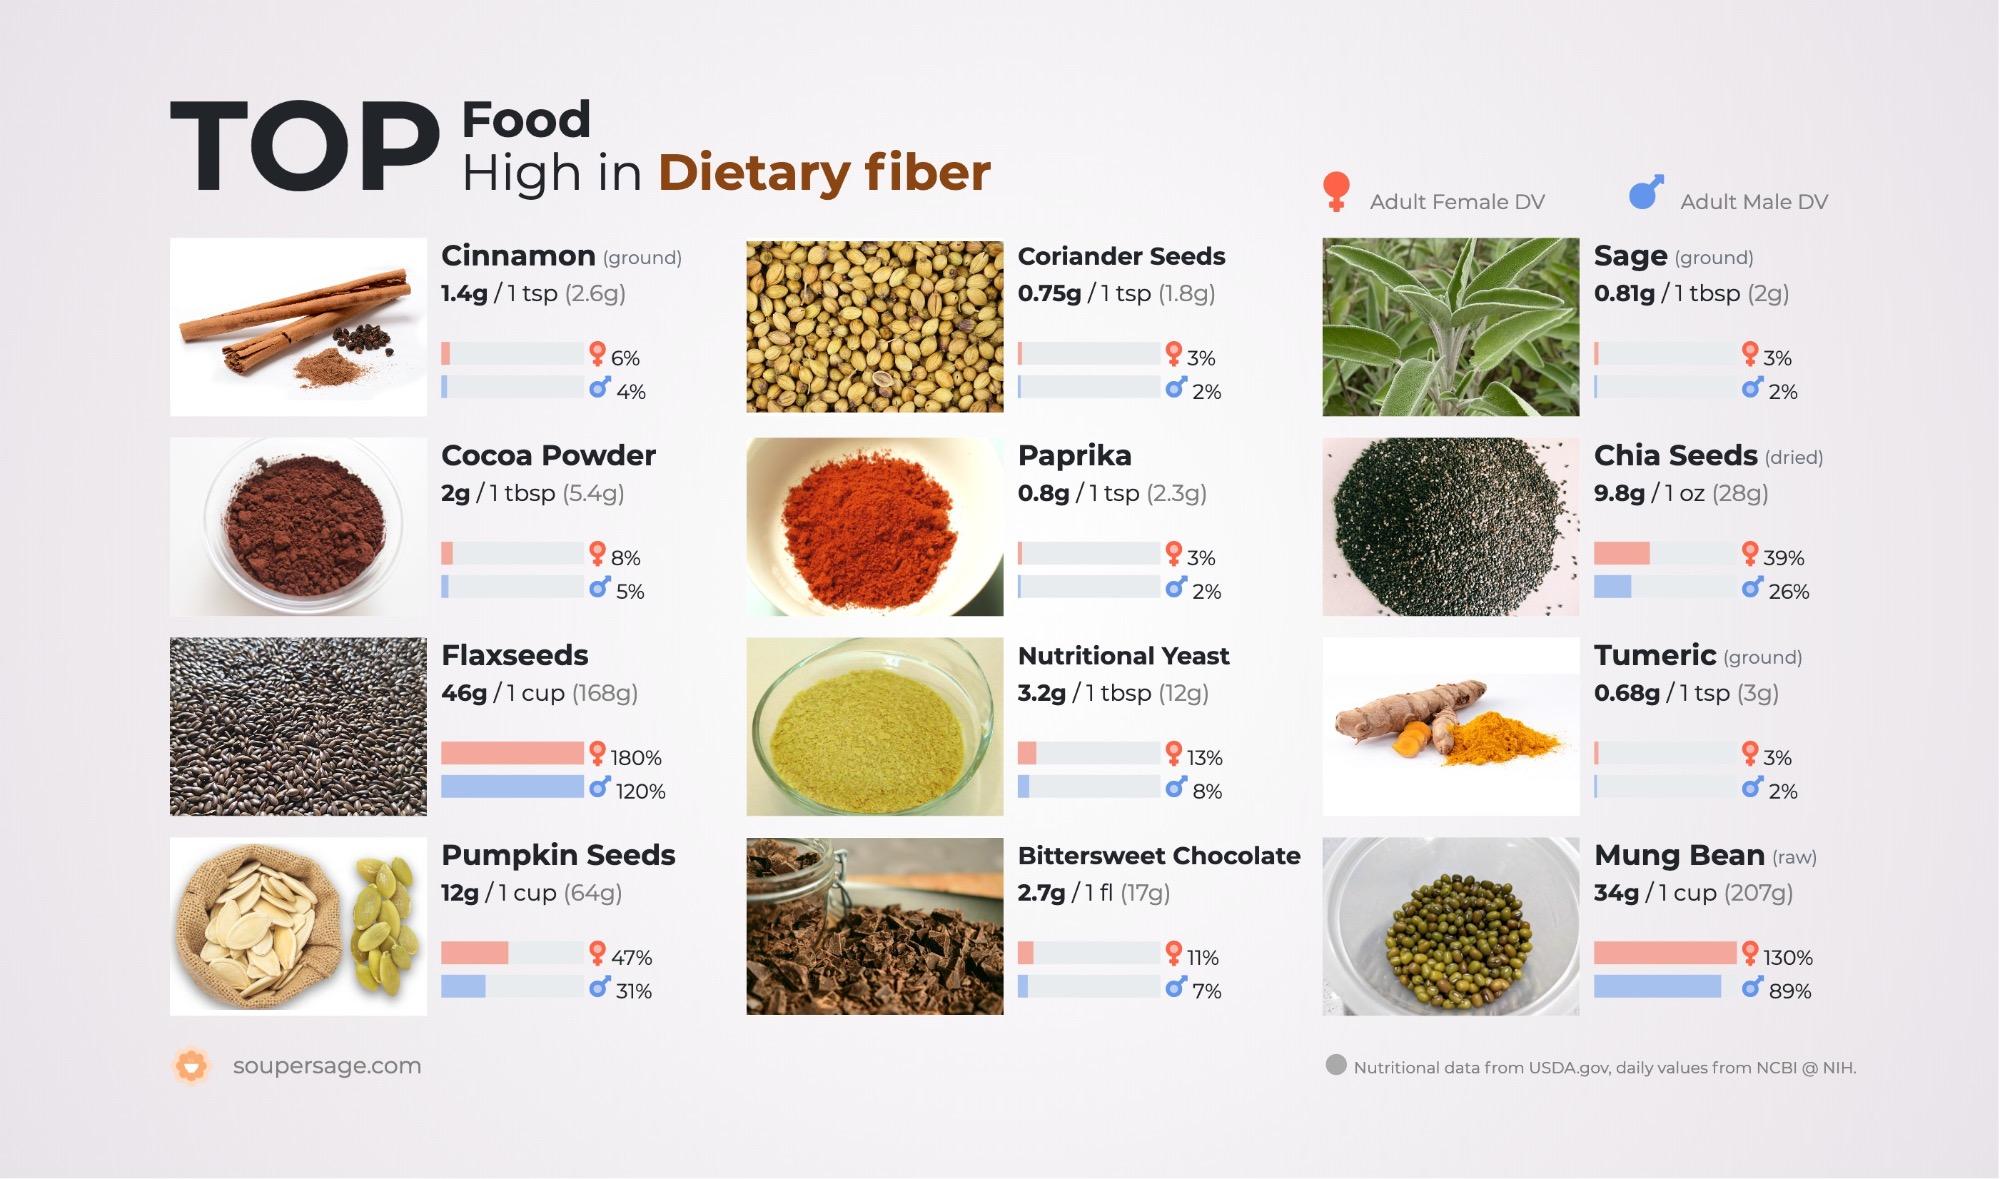 image of Top Food High in Dietary fiber